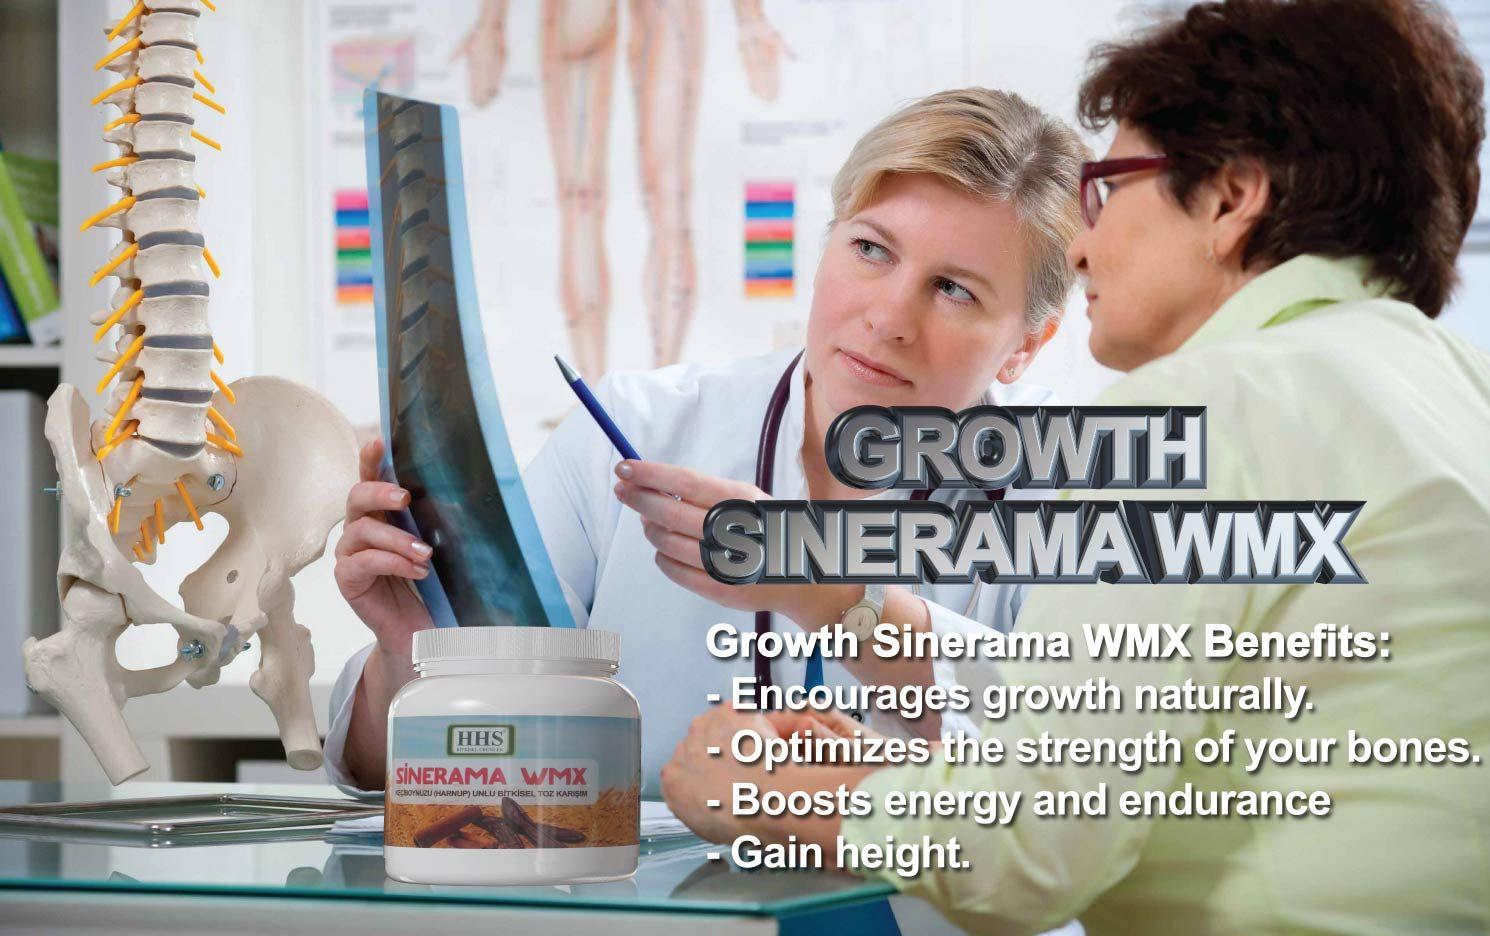 Growth-Sinerama WMX – Boost Your Height ! Growing Taller Naturally  #growthsineramawmx #growthsinerama #growtaller #heightincrease  #health #products #doctor #hgh #humangrowthhormone #growtallersupplement #stretchingexercise #howtogrowtallerfast #growtallernaturally #growtallerproduct #growtallerexercises #growtallerpills #howdoigrowtaller #waystogrowtaller #growtallervitamins #basketball #short #tall #model #sport #bodybuilding #supplement #popular #love #girls #boys